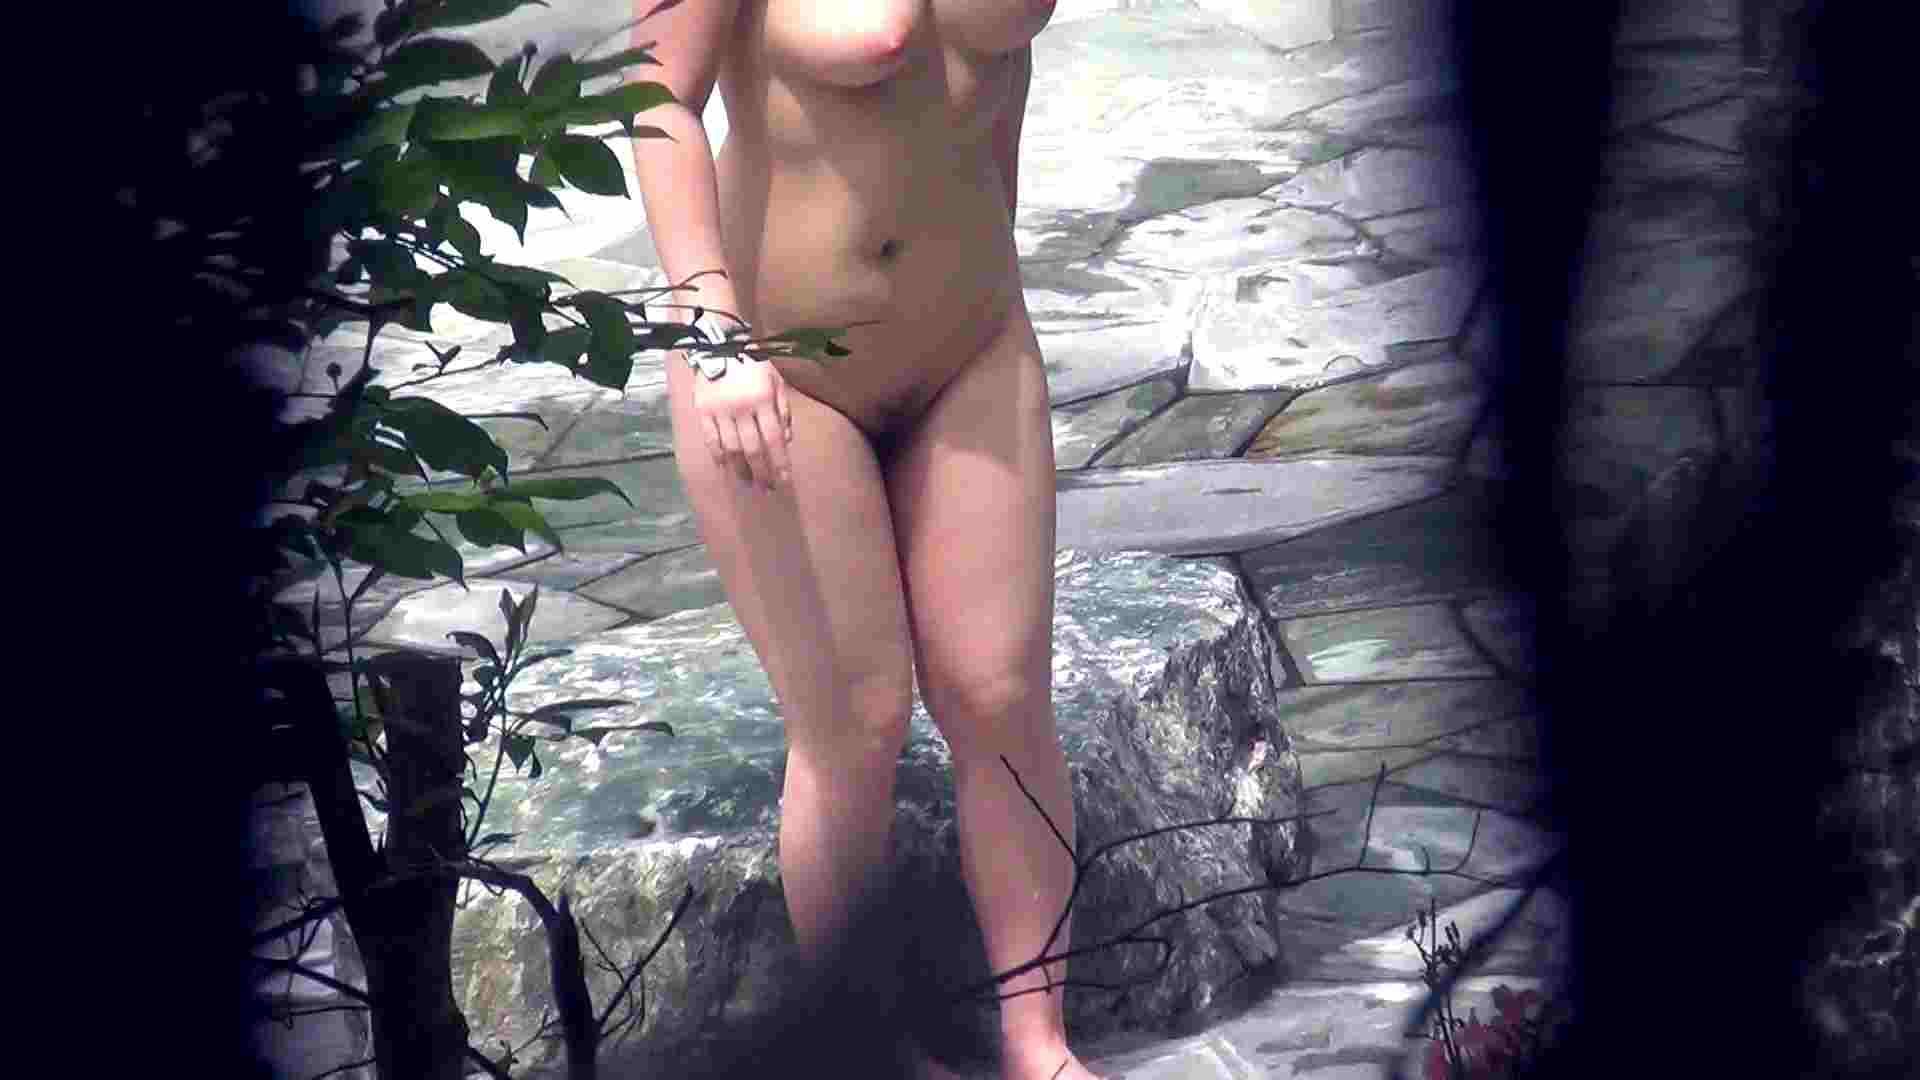 Vol.45 今度はshimaiでしょうか ムッチリ嬢の大胆開脚 潜伏露天風呂 盗撮アダルト動画キャプチャ 99pic 74